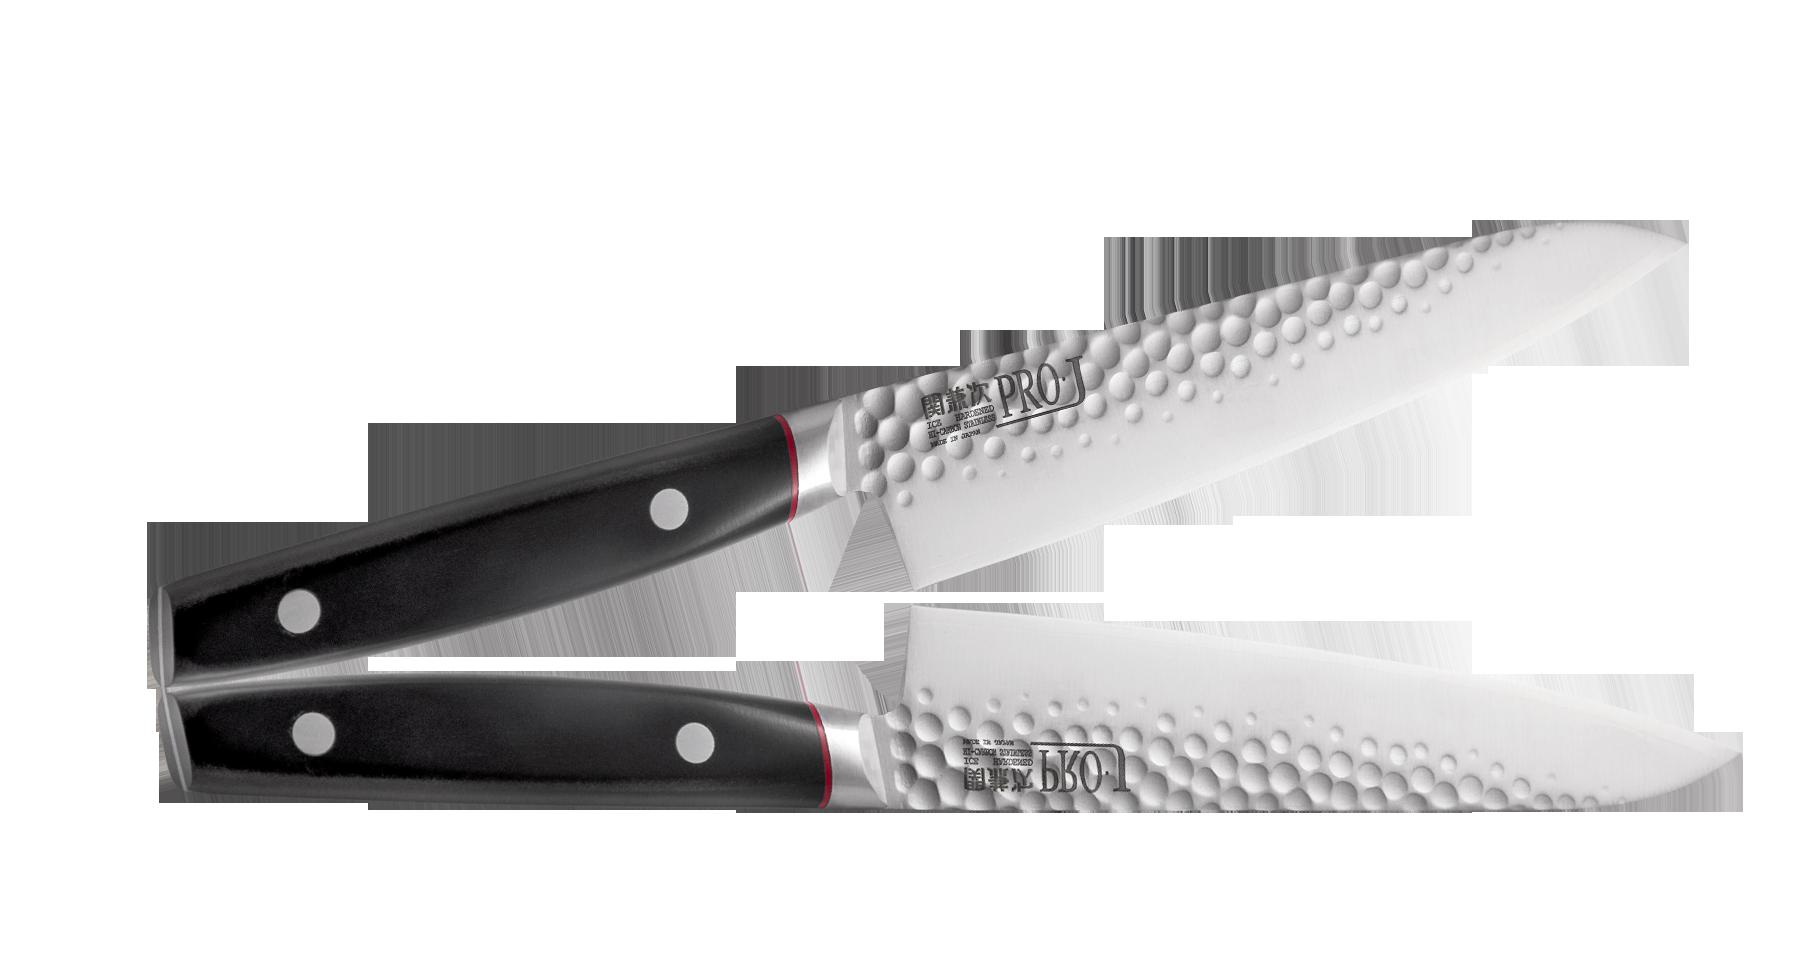 Нож Универсальный Kanetsugu Pro-J 150 мм, сталь ZA-18 Tojiro